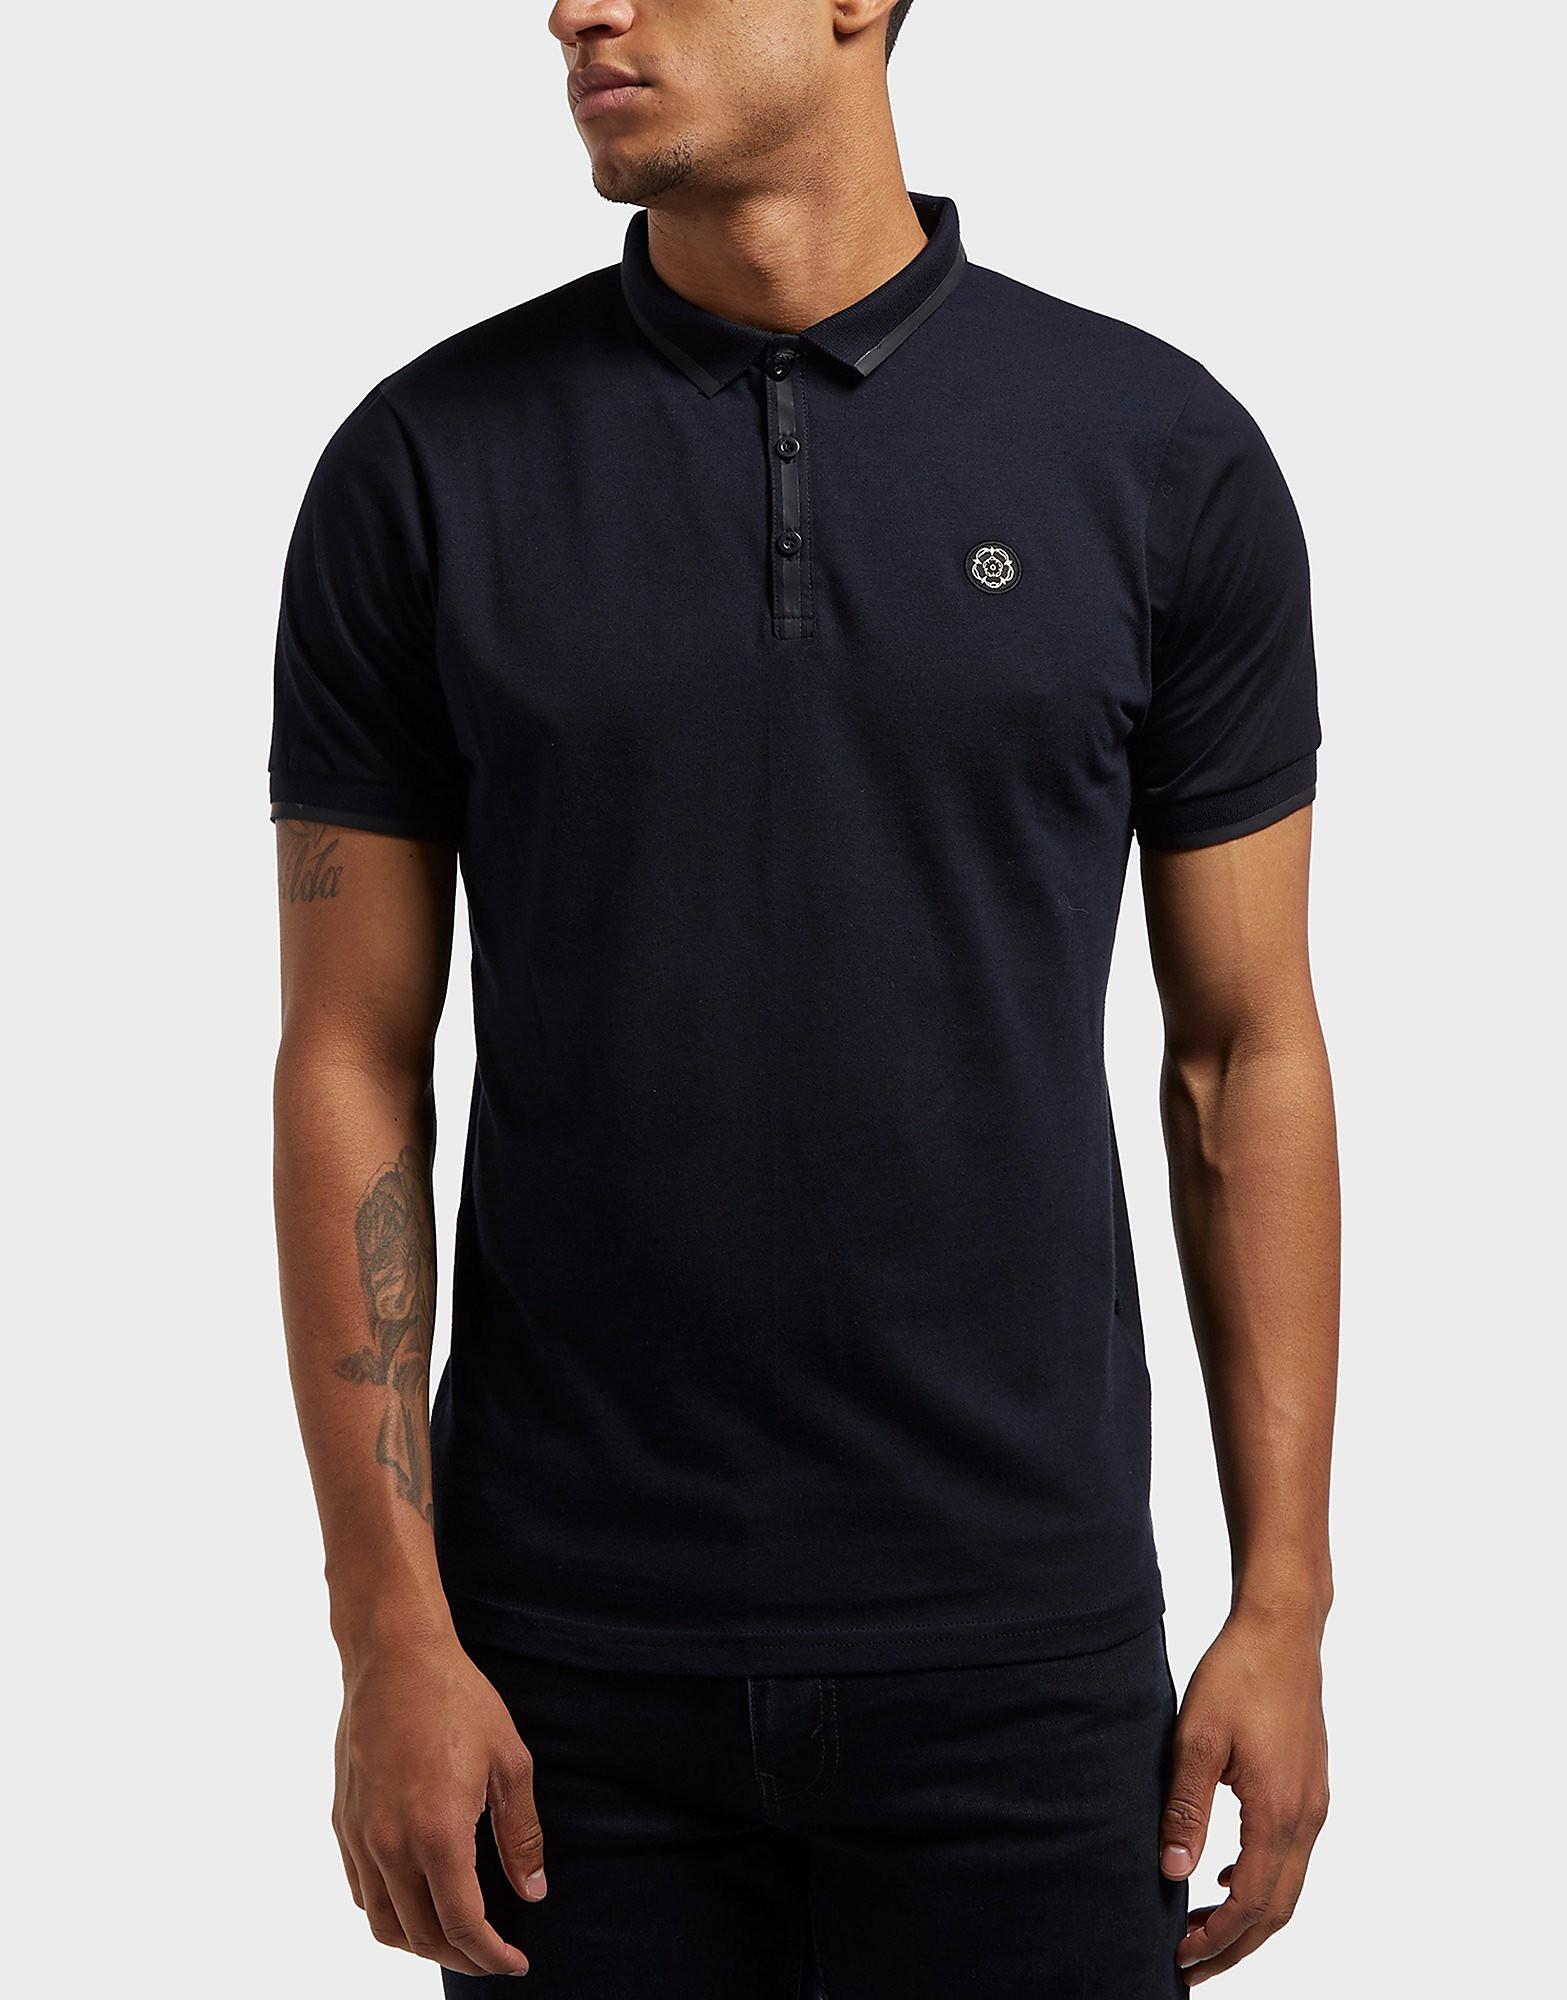 Nicholas Deakins Troy Short Sleeve Polo Shirt - Exclusive